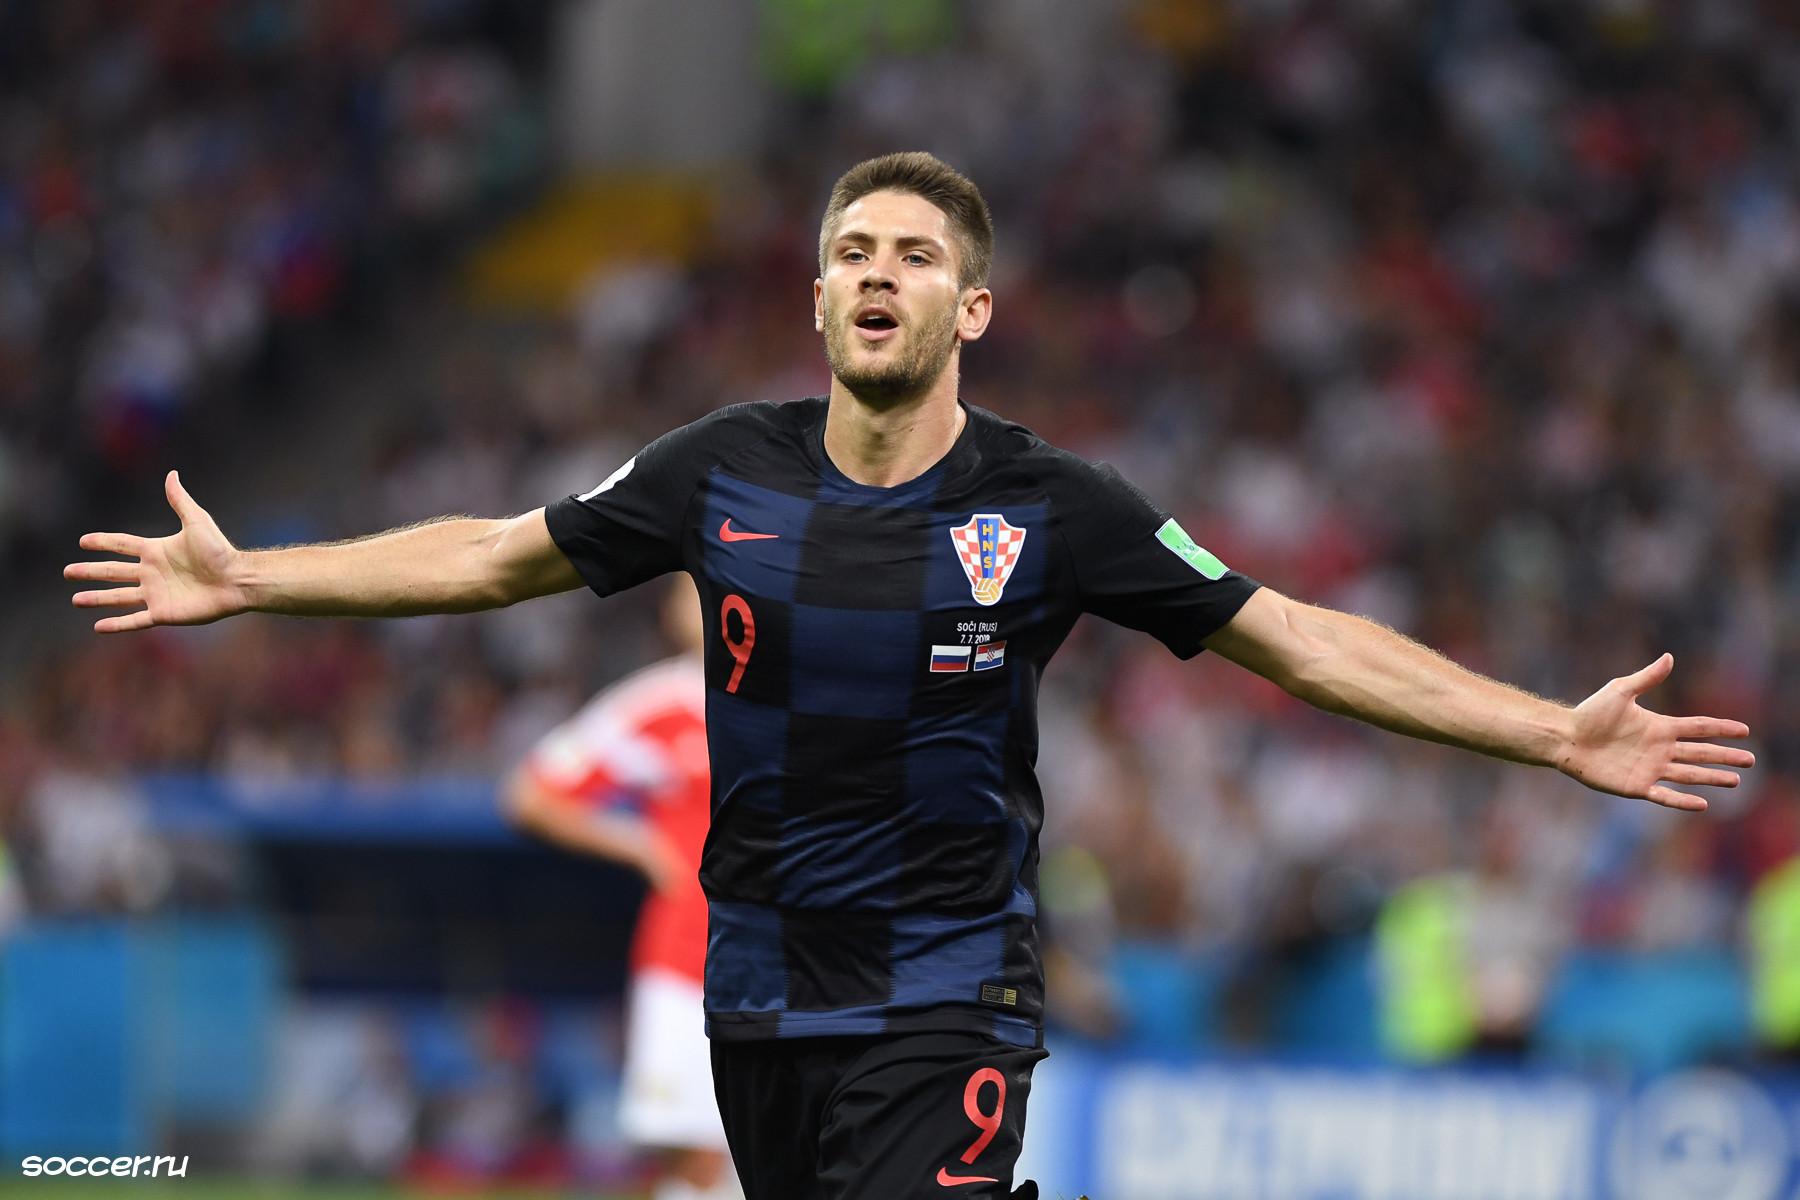 Hoffenheim striker Andrej Kramaric in action for his beloved Croatian international side.